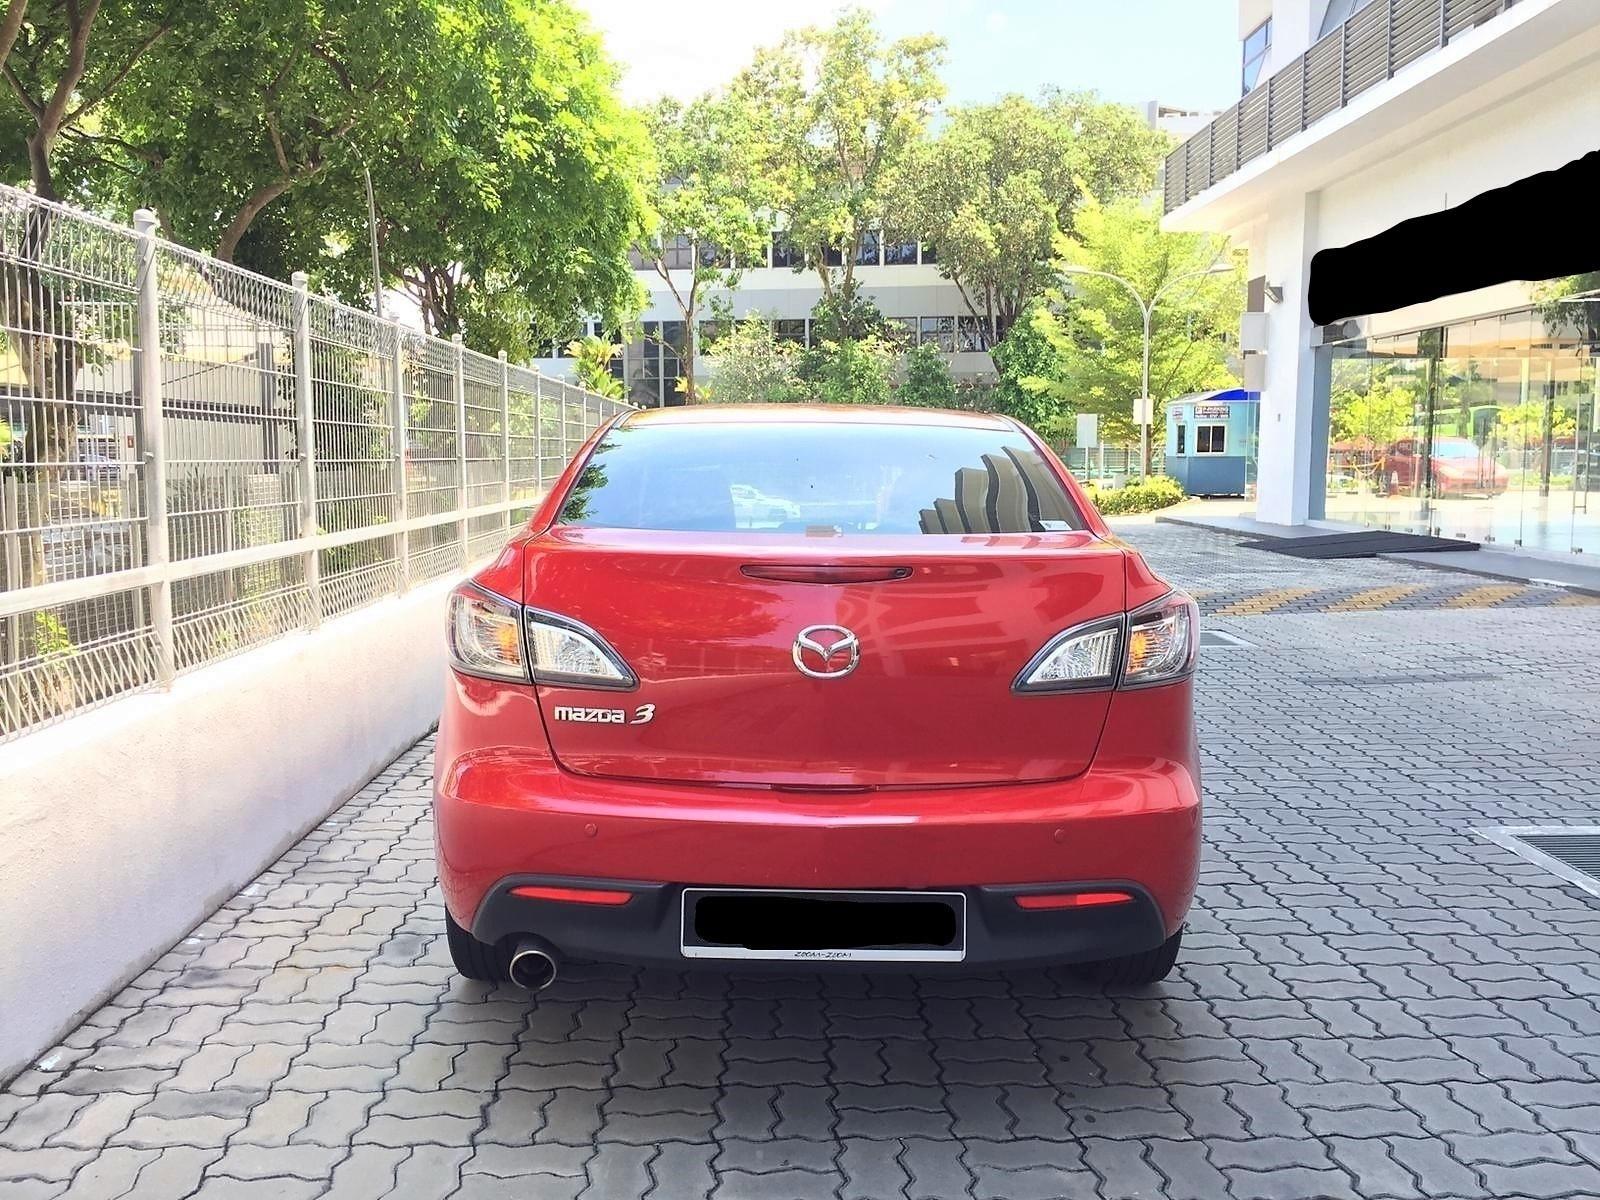 Mazda 3 For Rental (PHV/Personal Usage) Price Reduce